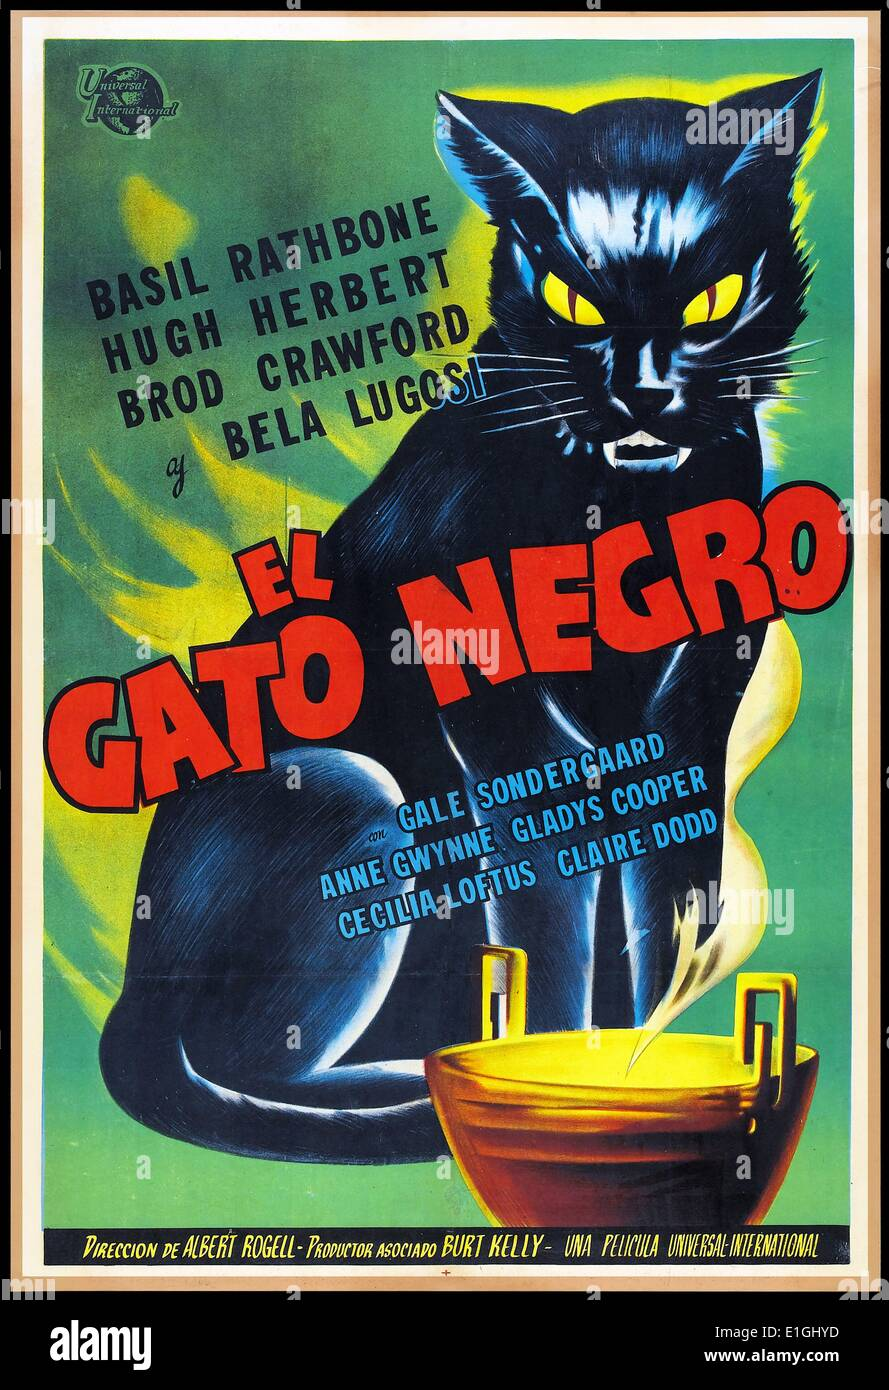 Poster do filme Gato Negro